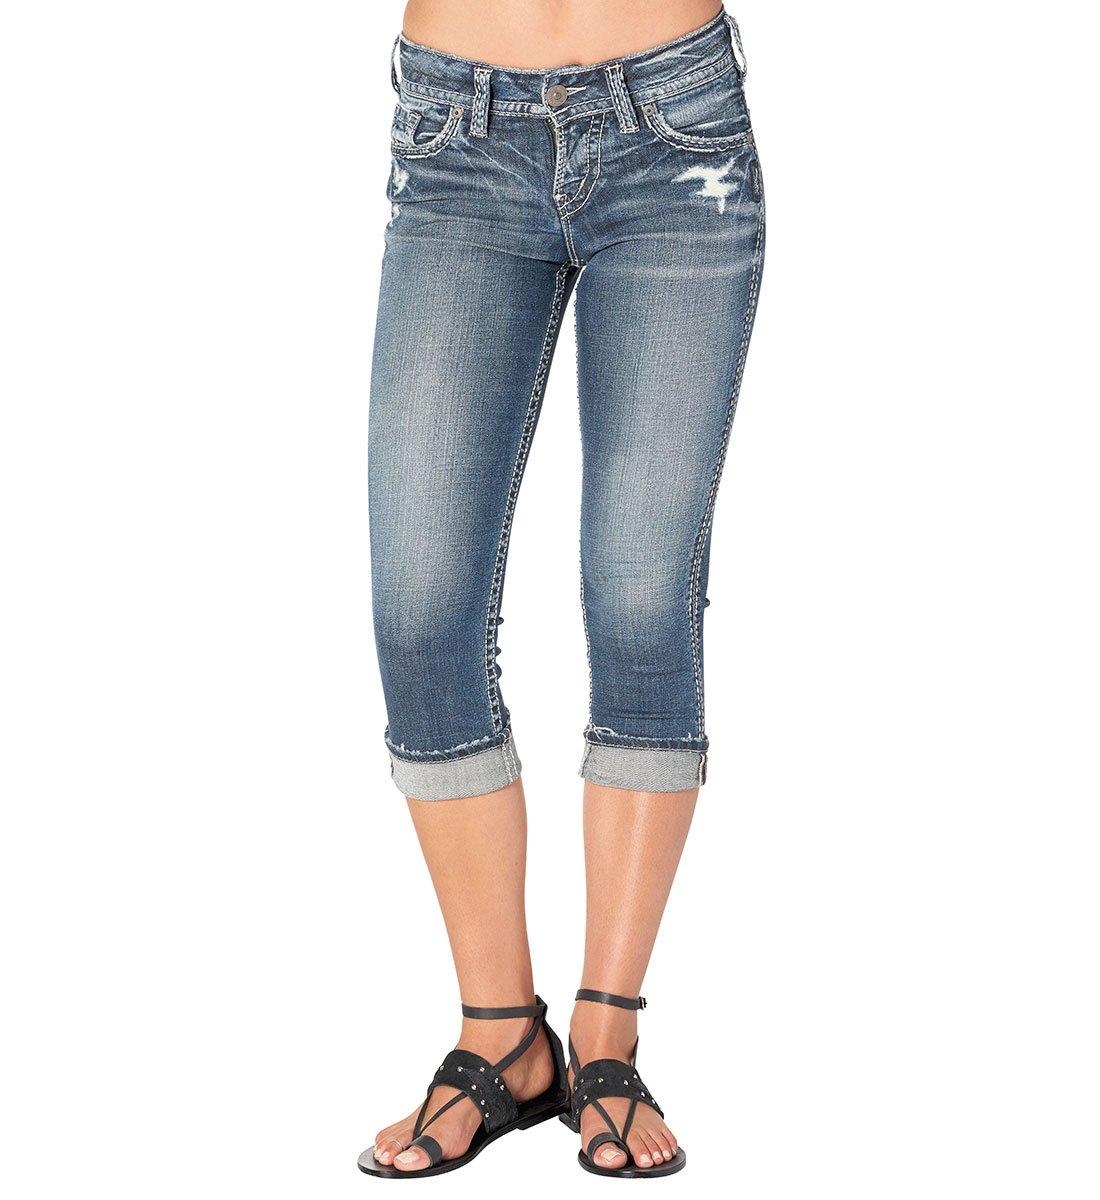 Silver Jeans Women's Suki Perfectly Curvy-Fit Mid-Rise Capri Dark Wash, Vintage Dark Heritage, 28